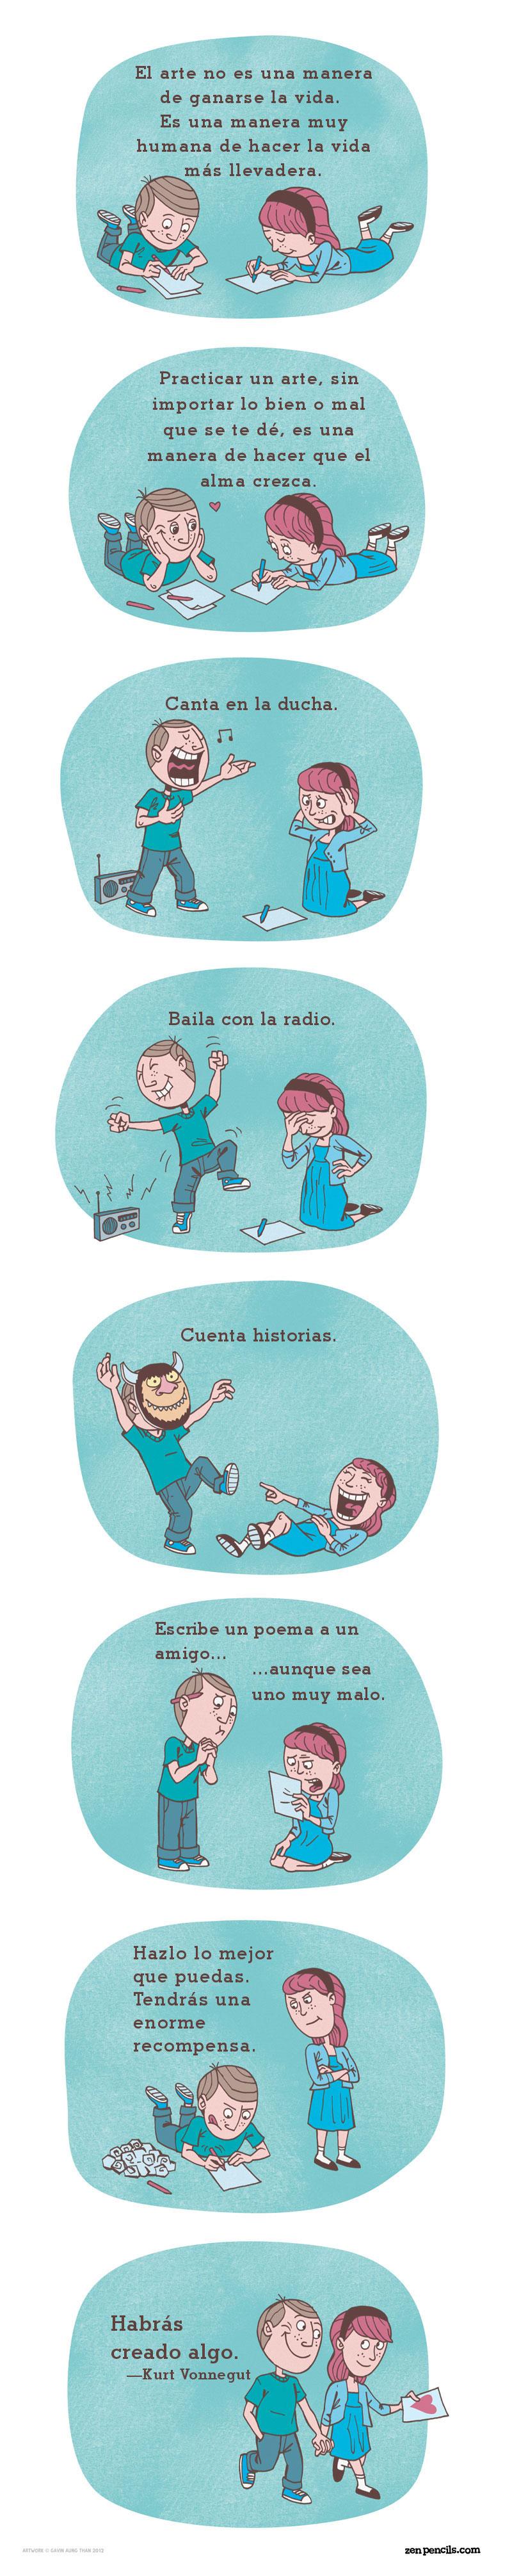 2010-01-23-49-Vonnegut-2-SPANISH-1.jpg